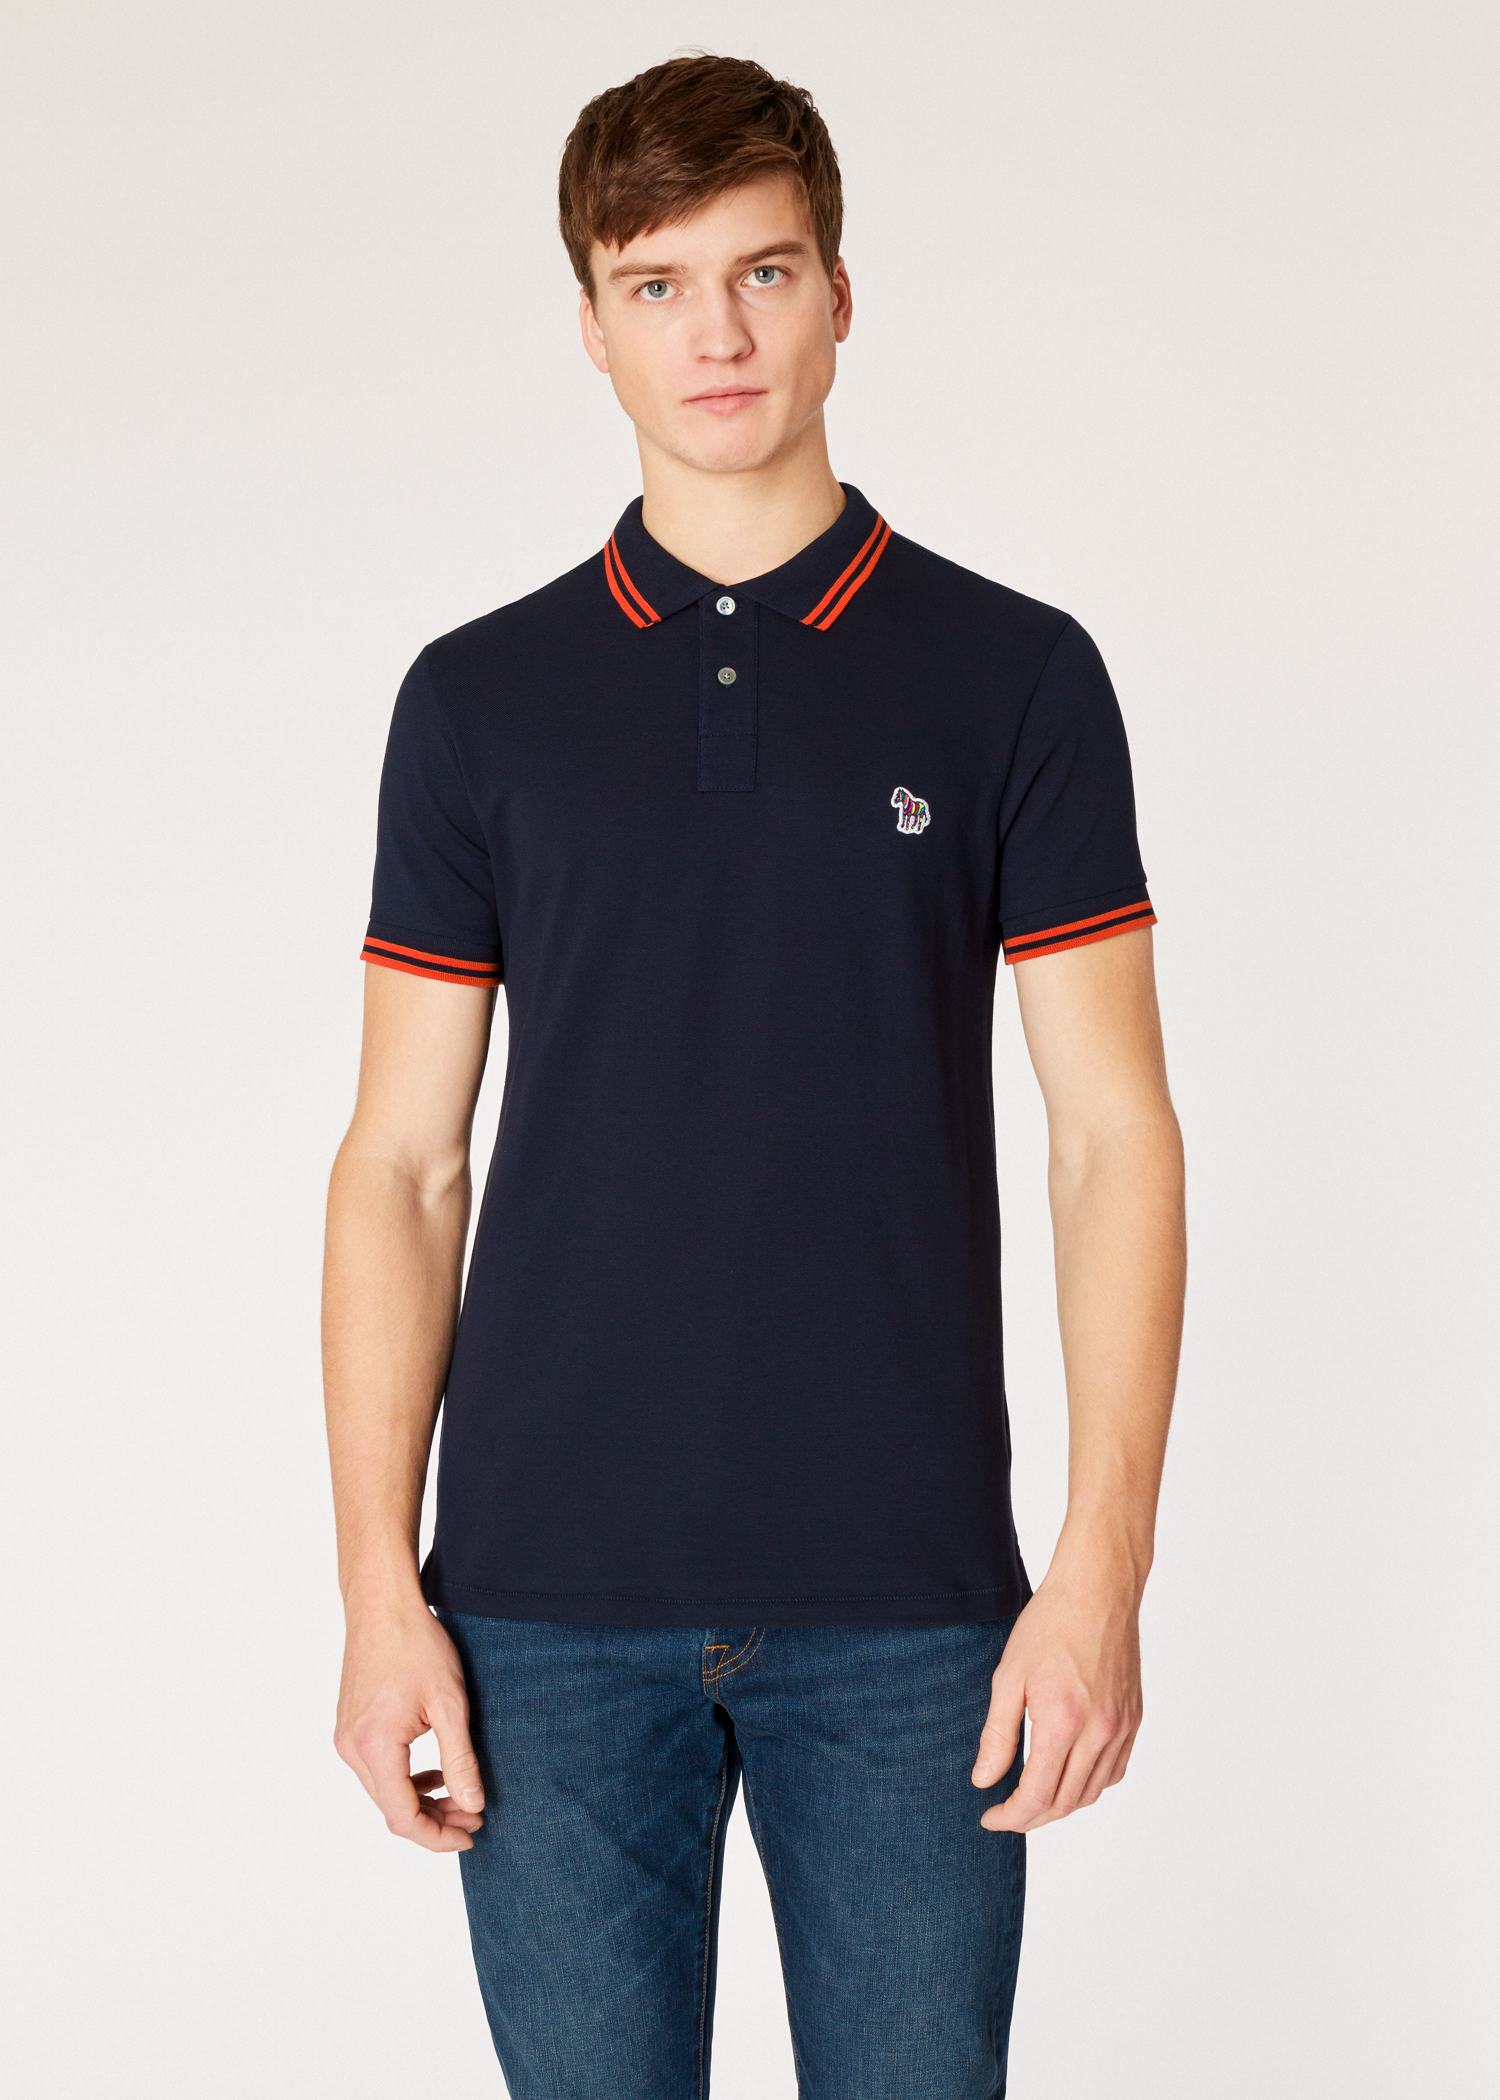 Mens Slim Fit Dark Navy Zebra Polo Shirt With Orange Tipping Paul